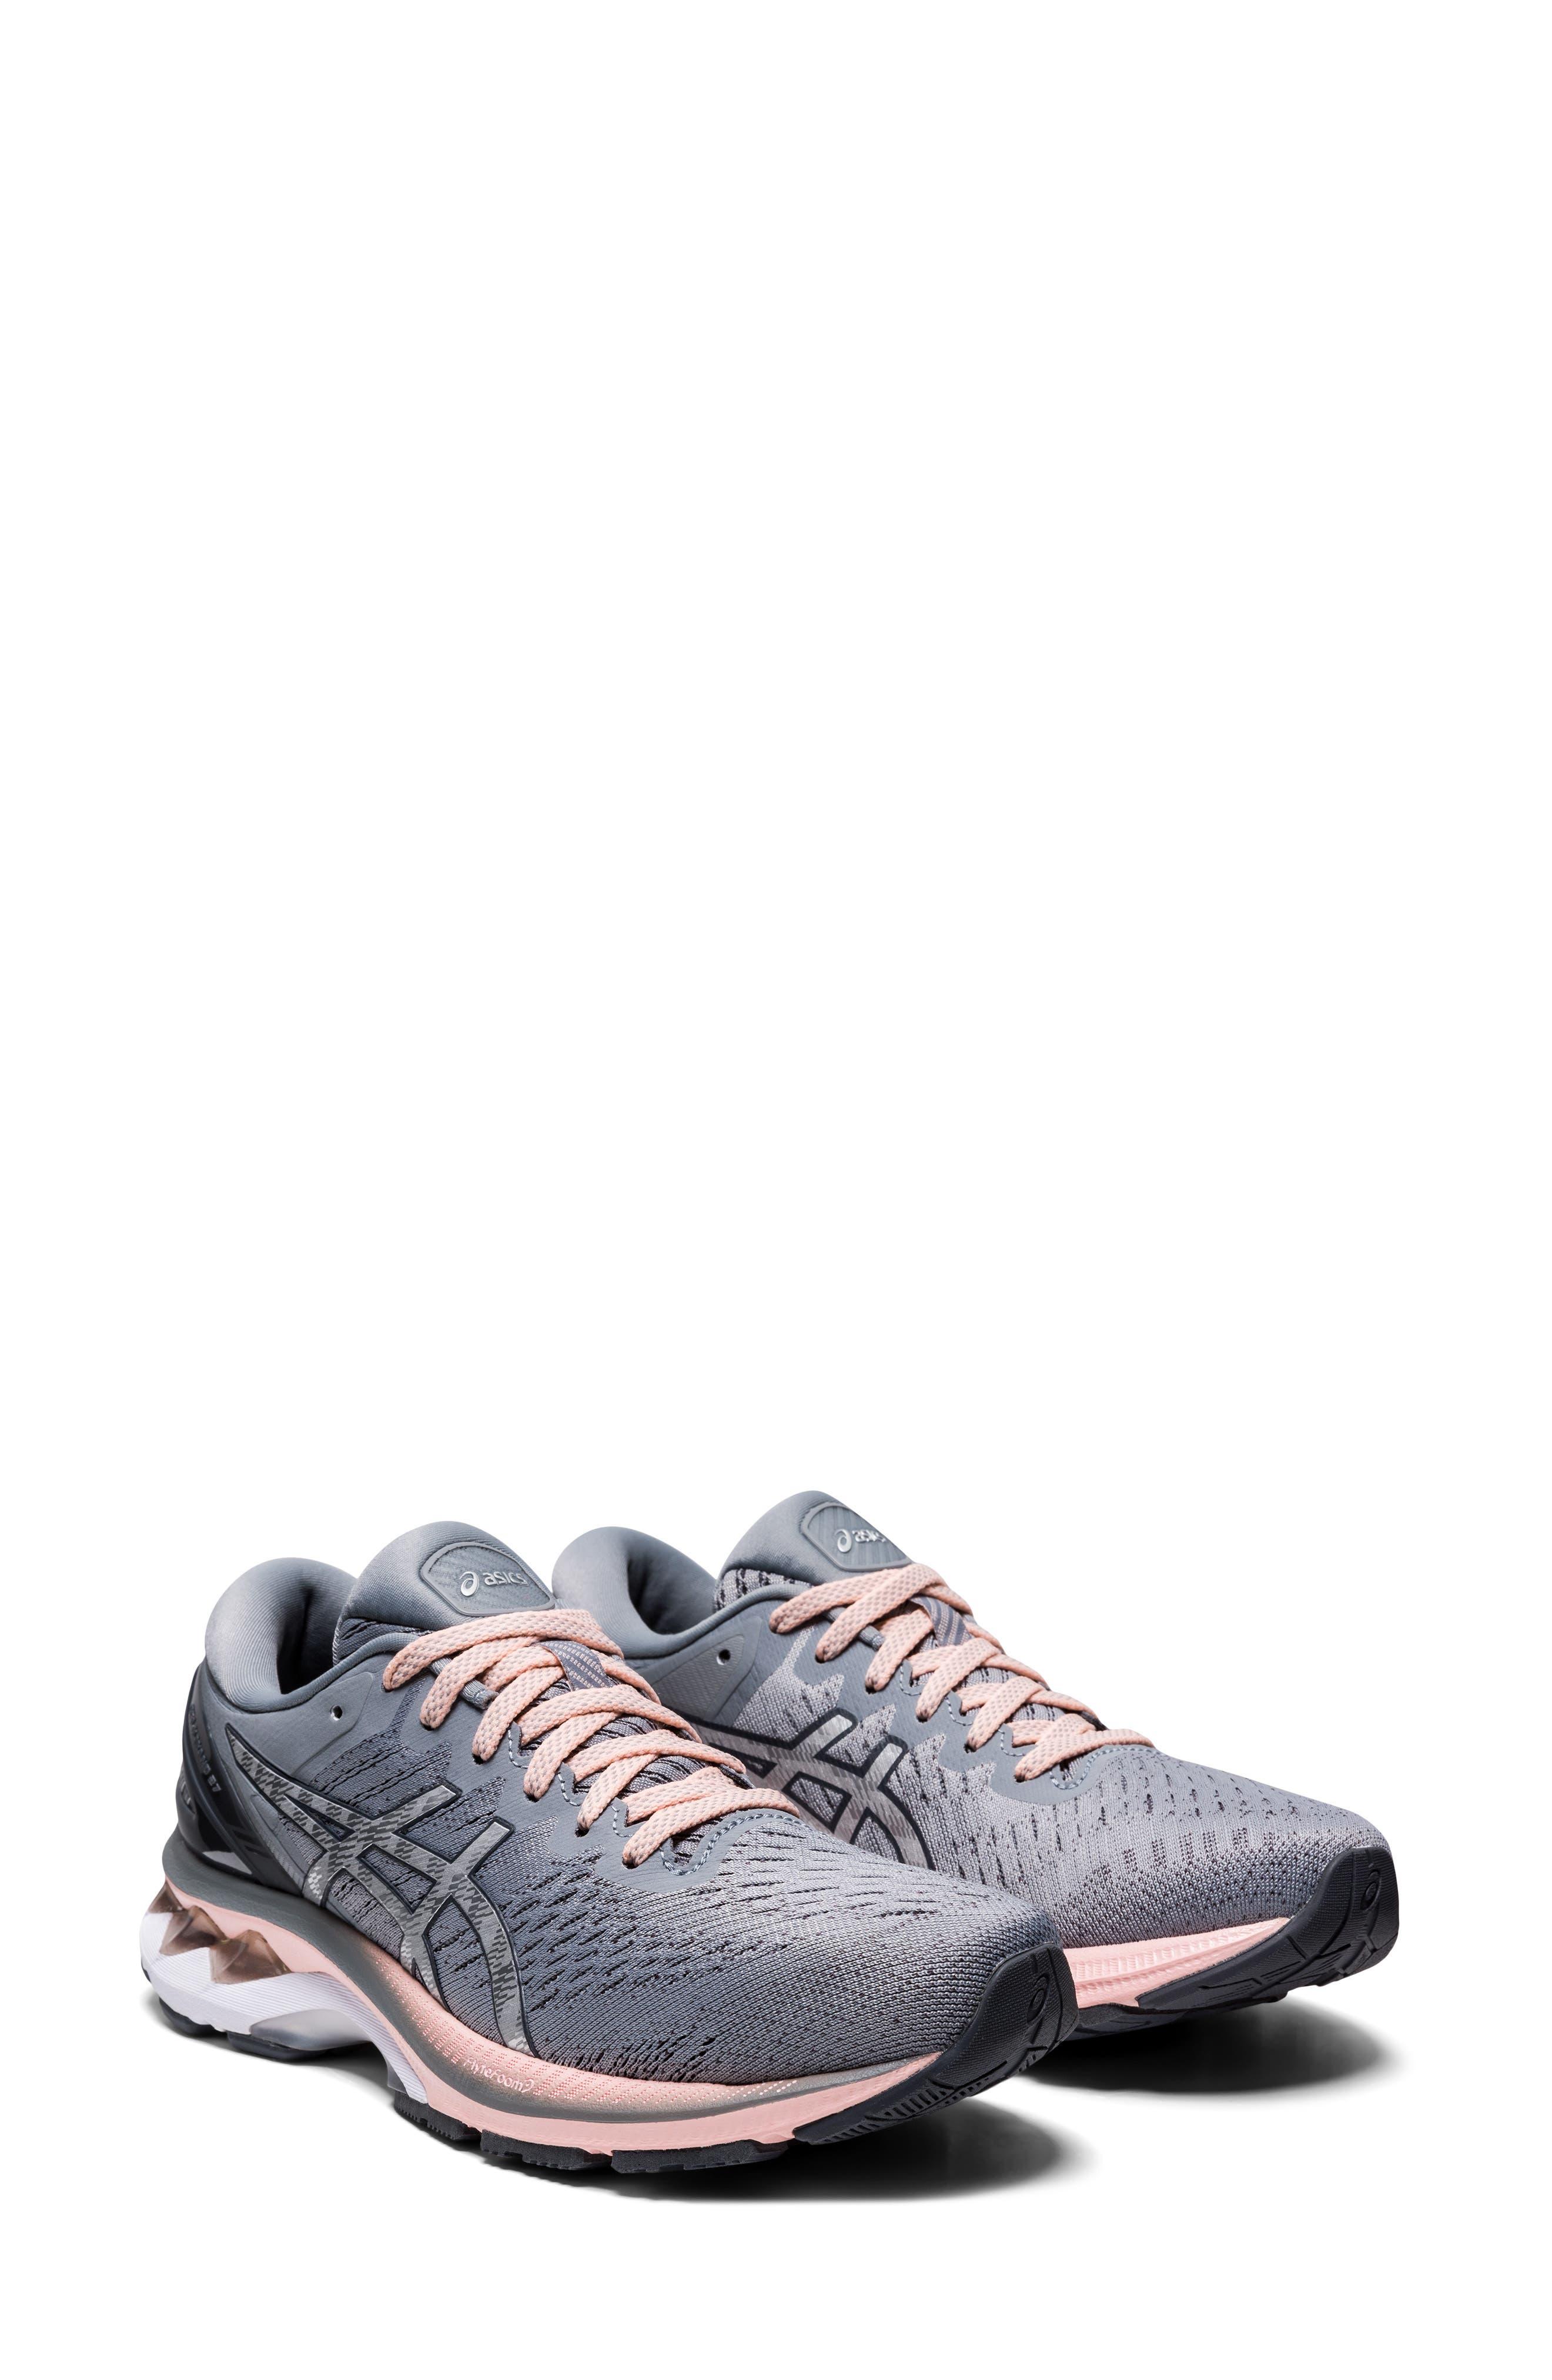 Women's Asics Gel-Kayano 27 Running Shoe